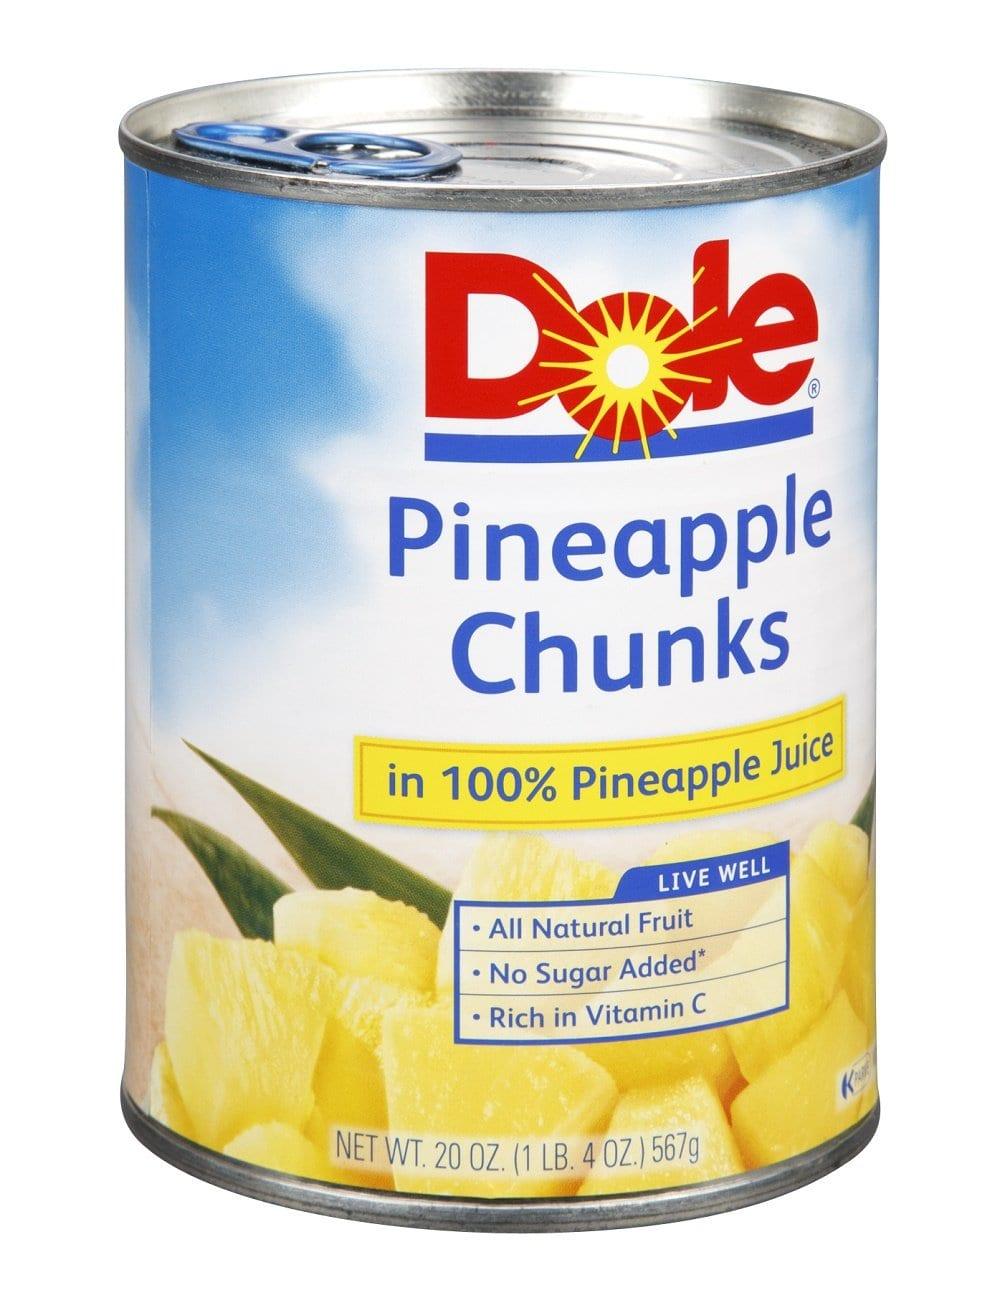 Dole, Pineapple Chunks in 100% Pineapple Juice